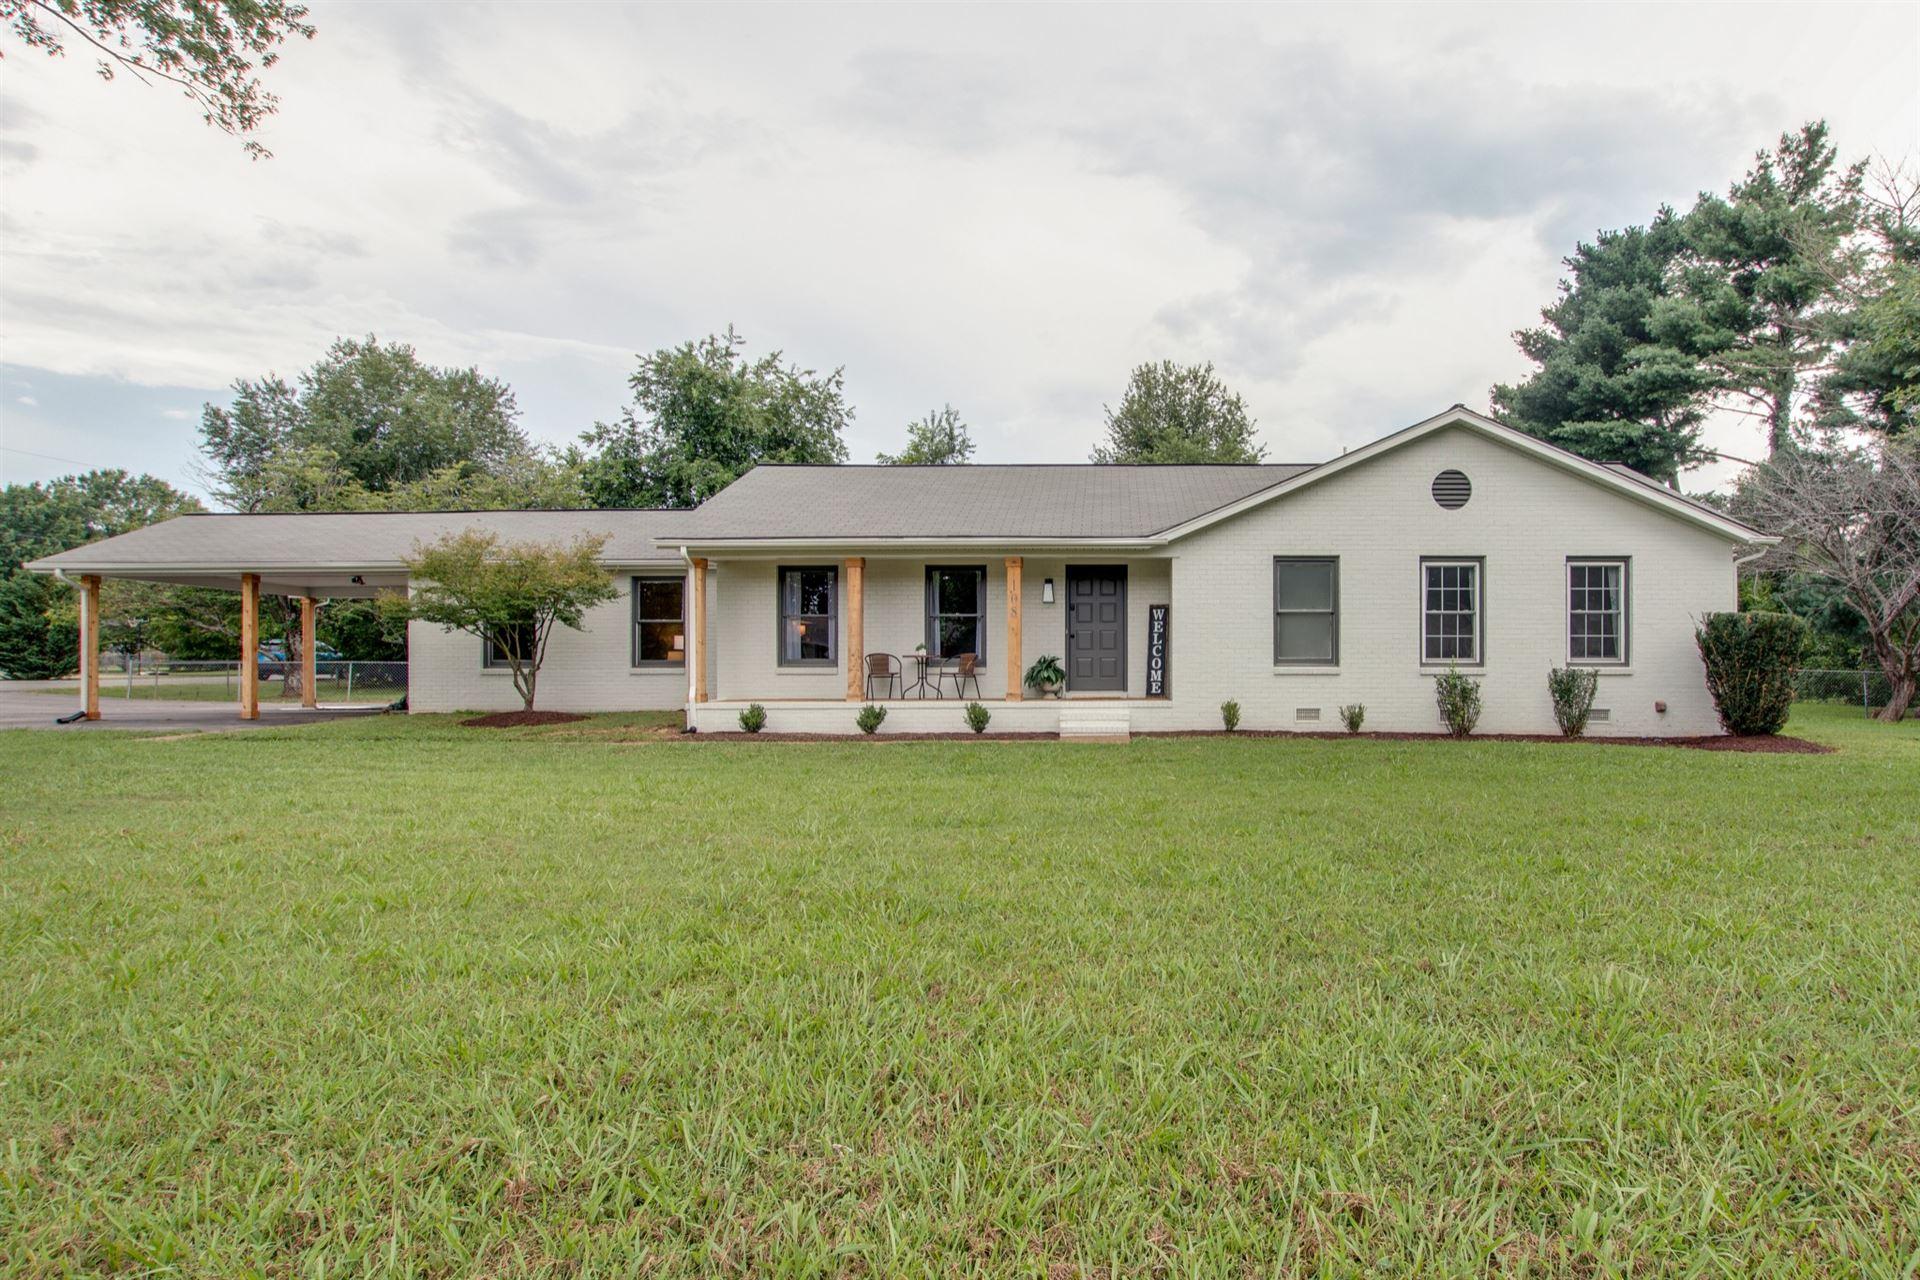 108 Hickory Hills Dr, Murfreesboro, TN 37128 - MLS#: 2172615